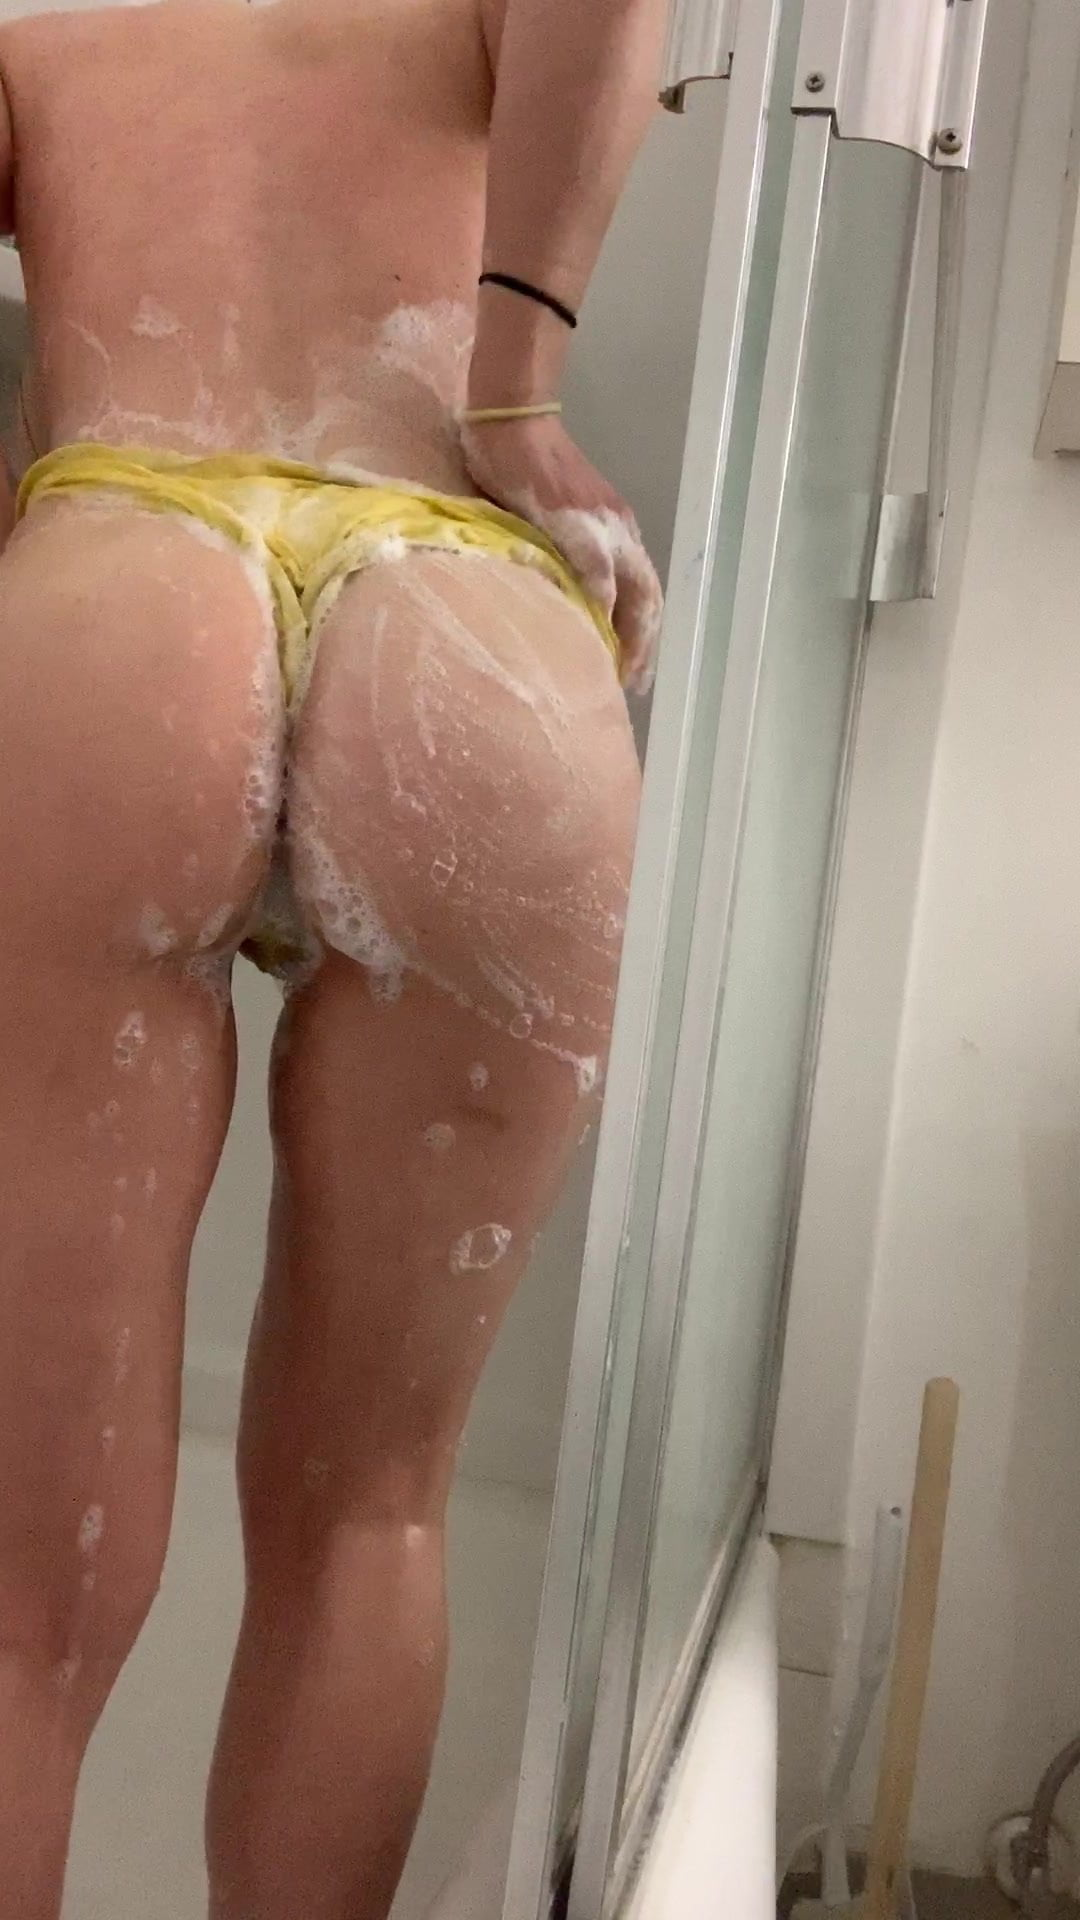 sparklebunneh taking part in within the bathe